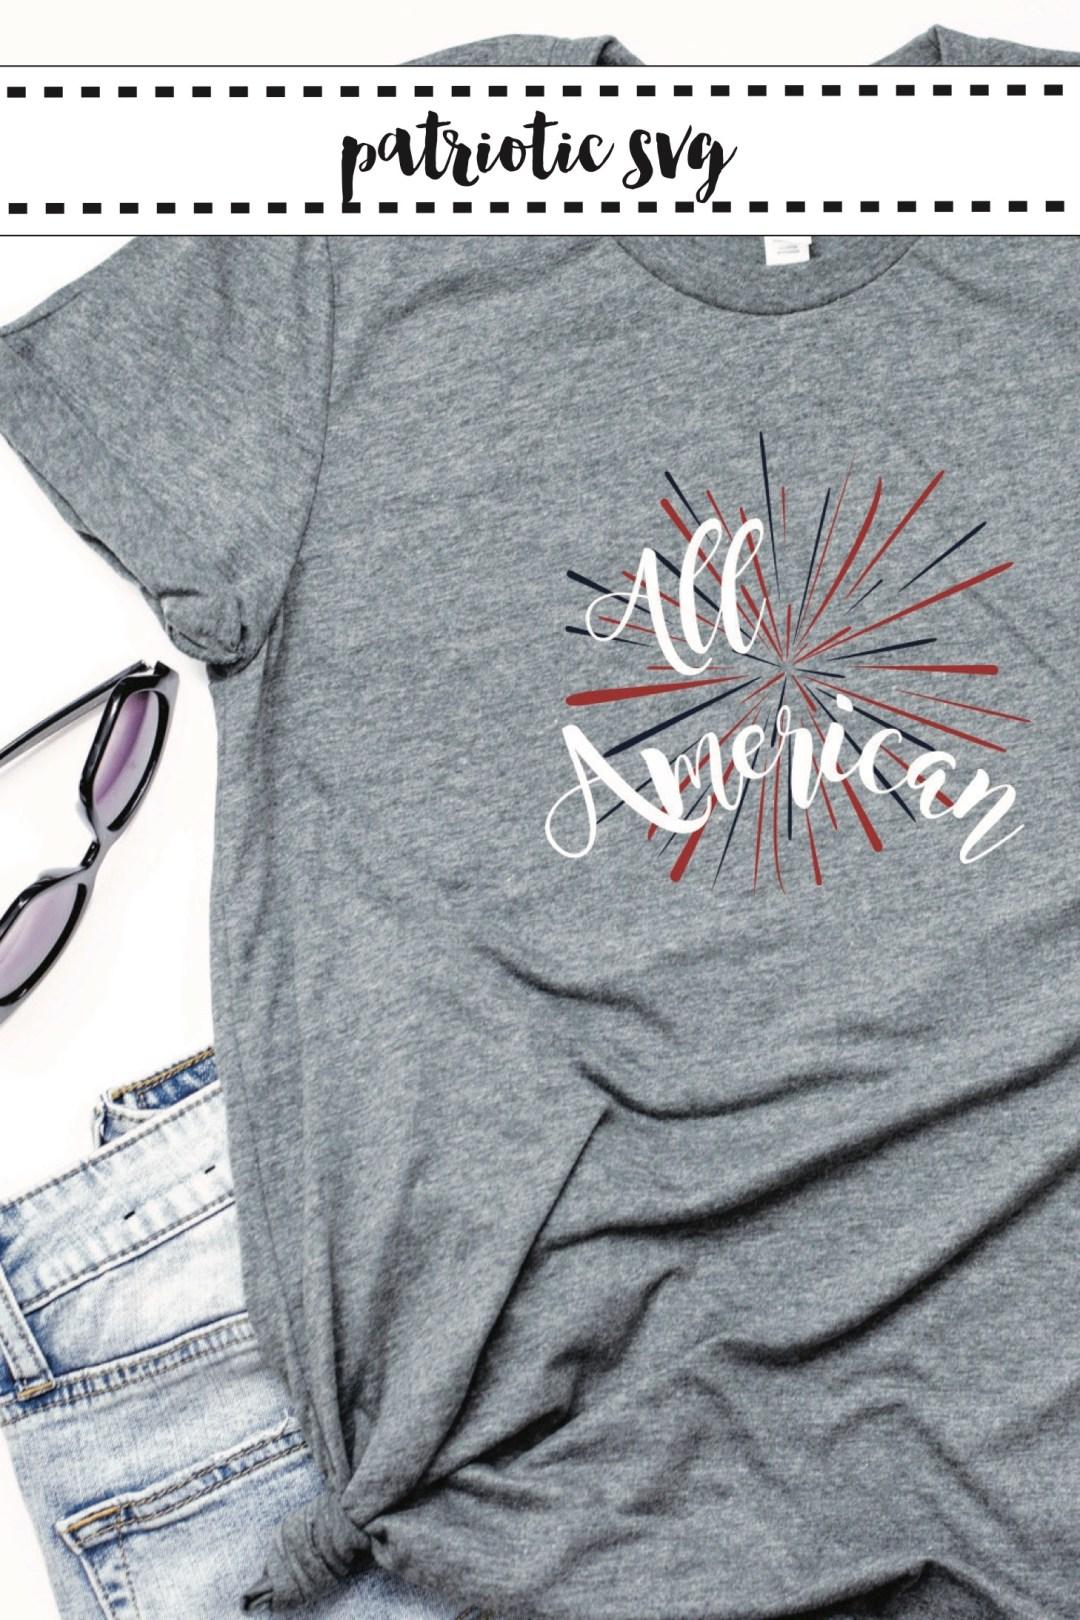 Fourth of July Shirt Jean Shorts Sunglasses